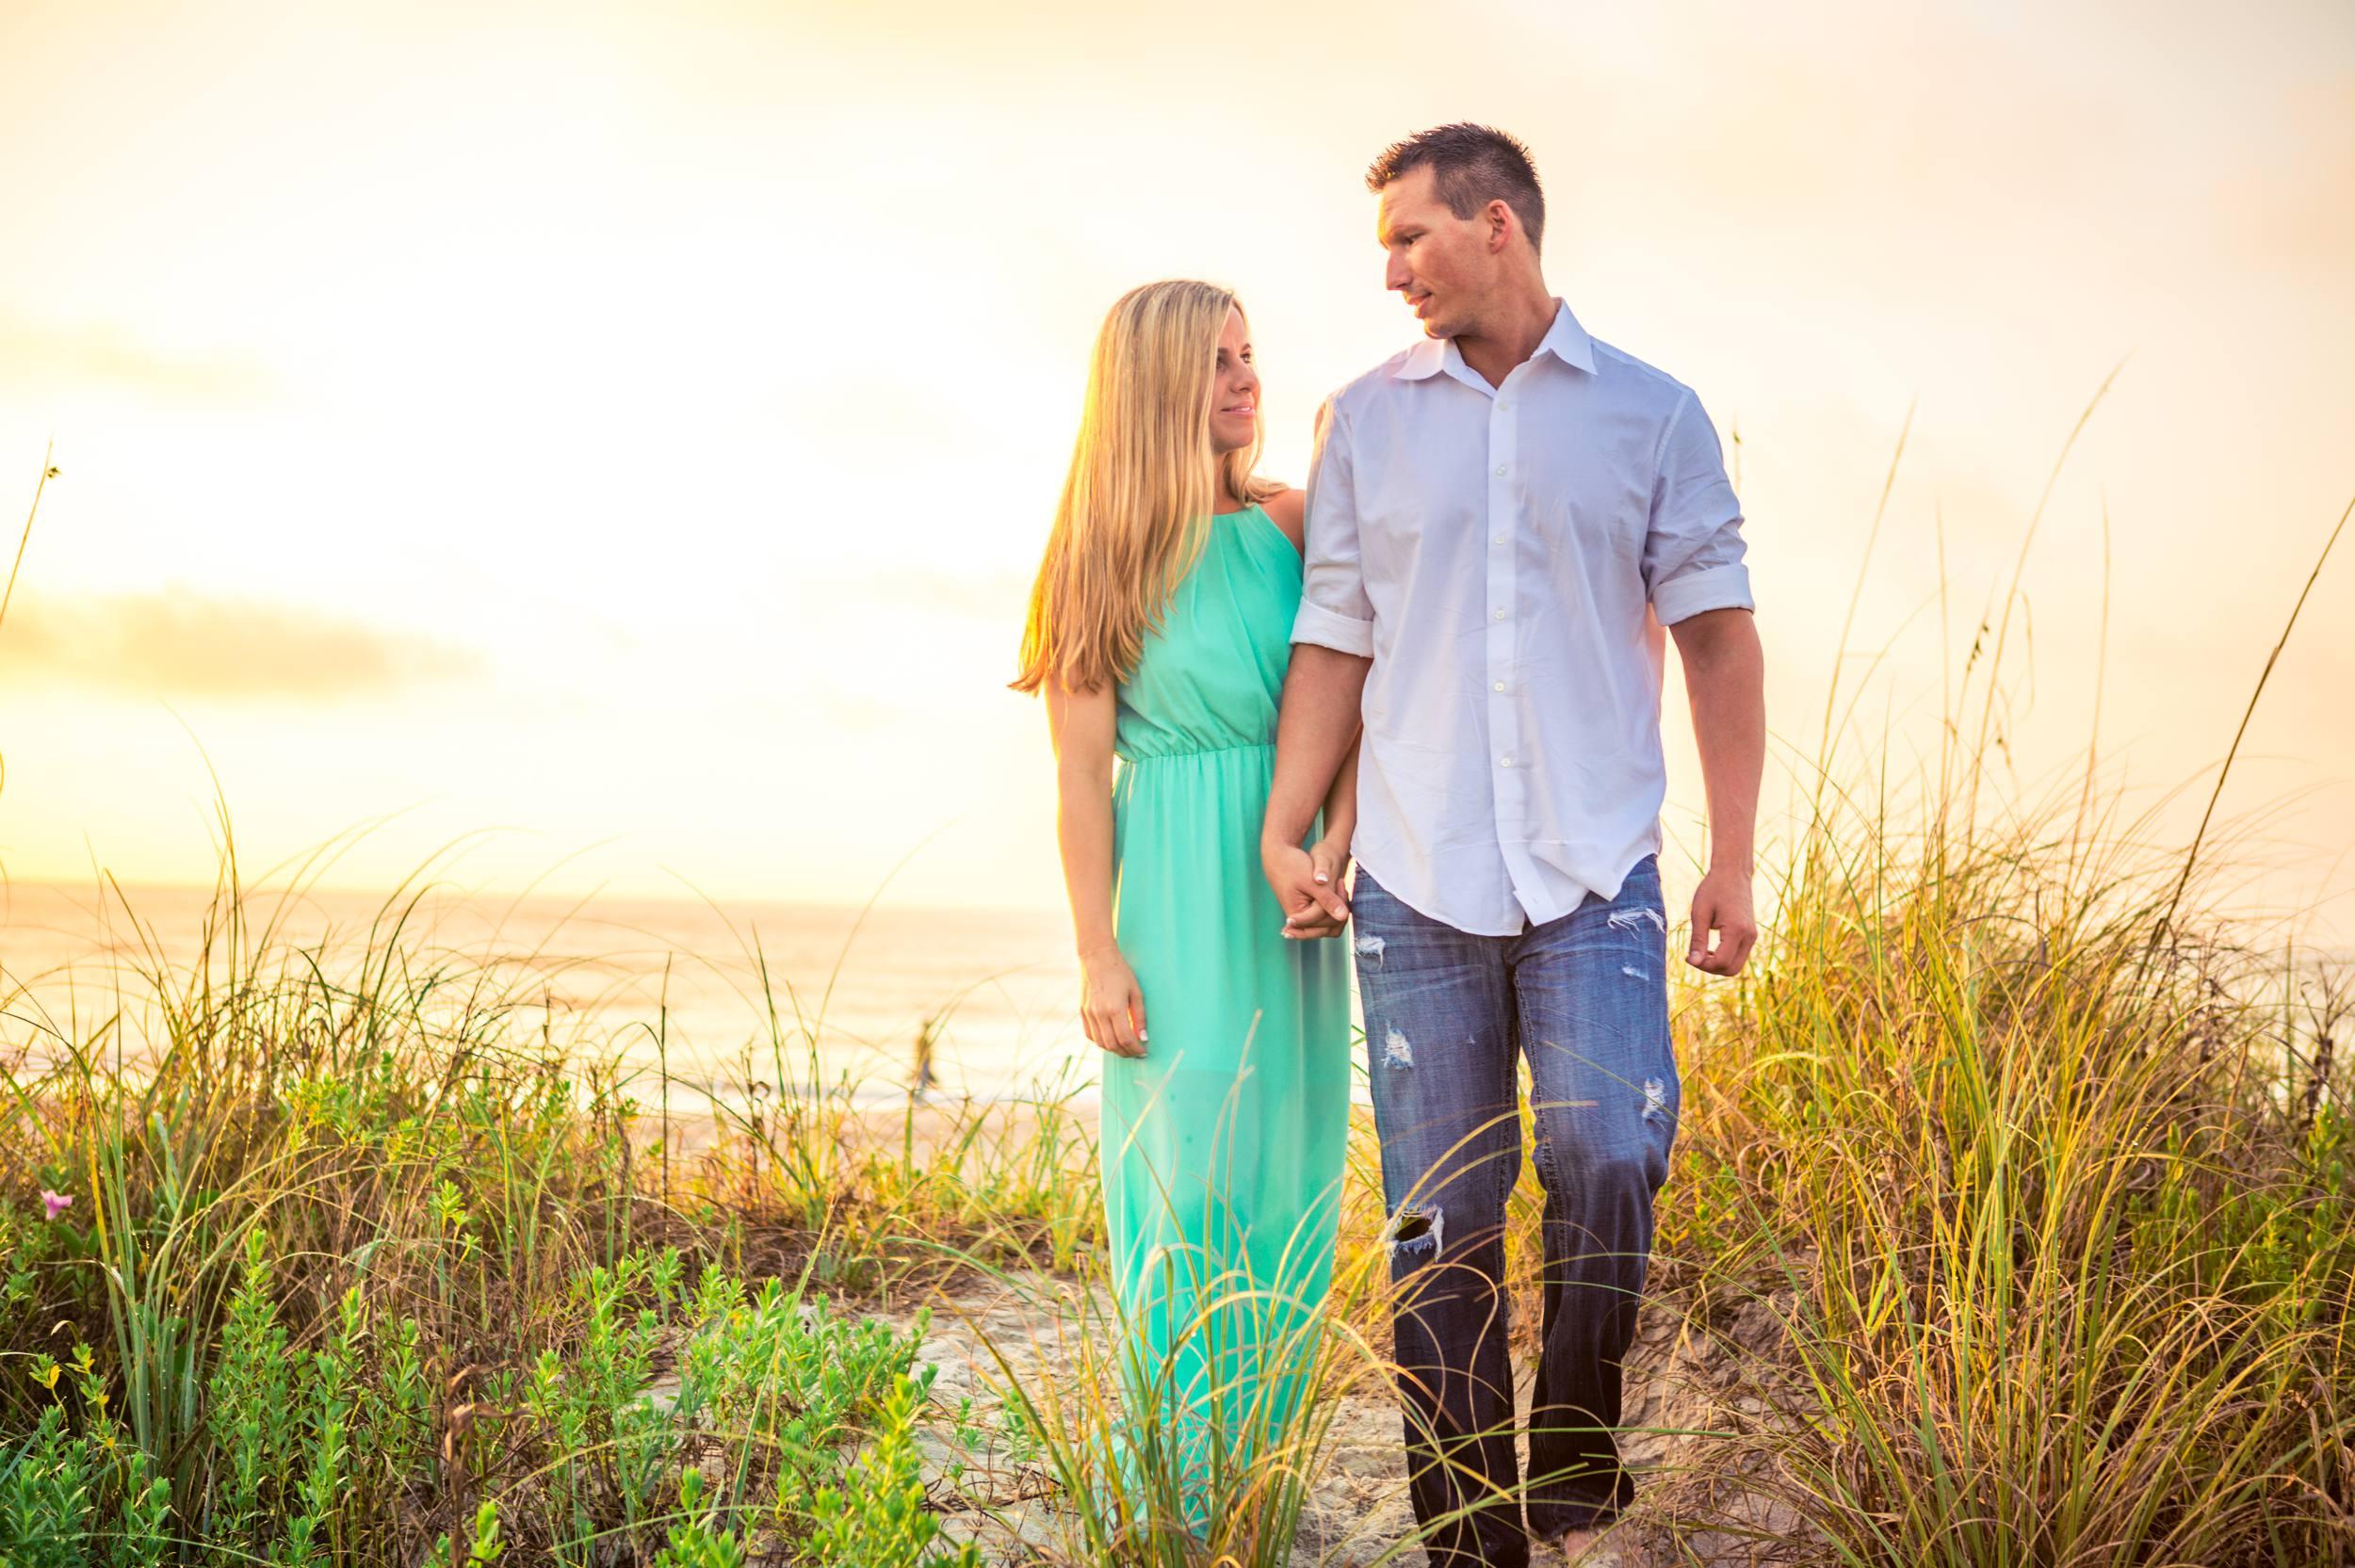 Lori Wilson Park Cocoa Beach Sunrise Engagement Session Mint Green dress- Bri 10.jpg